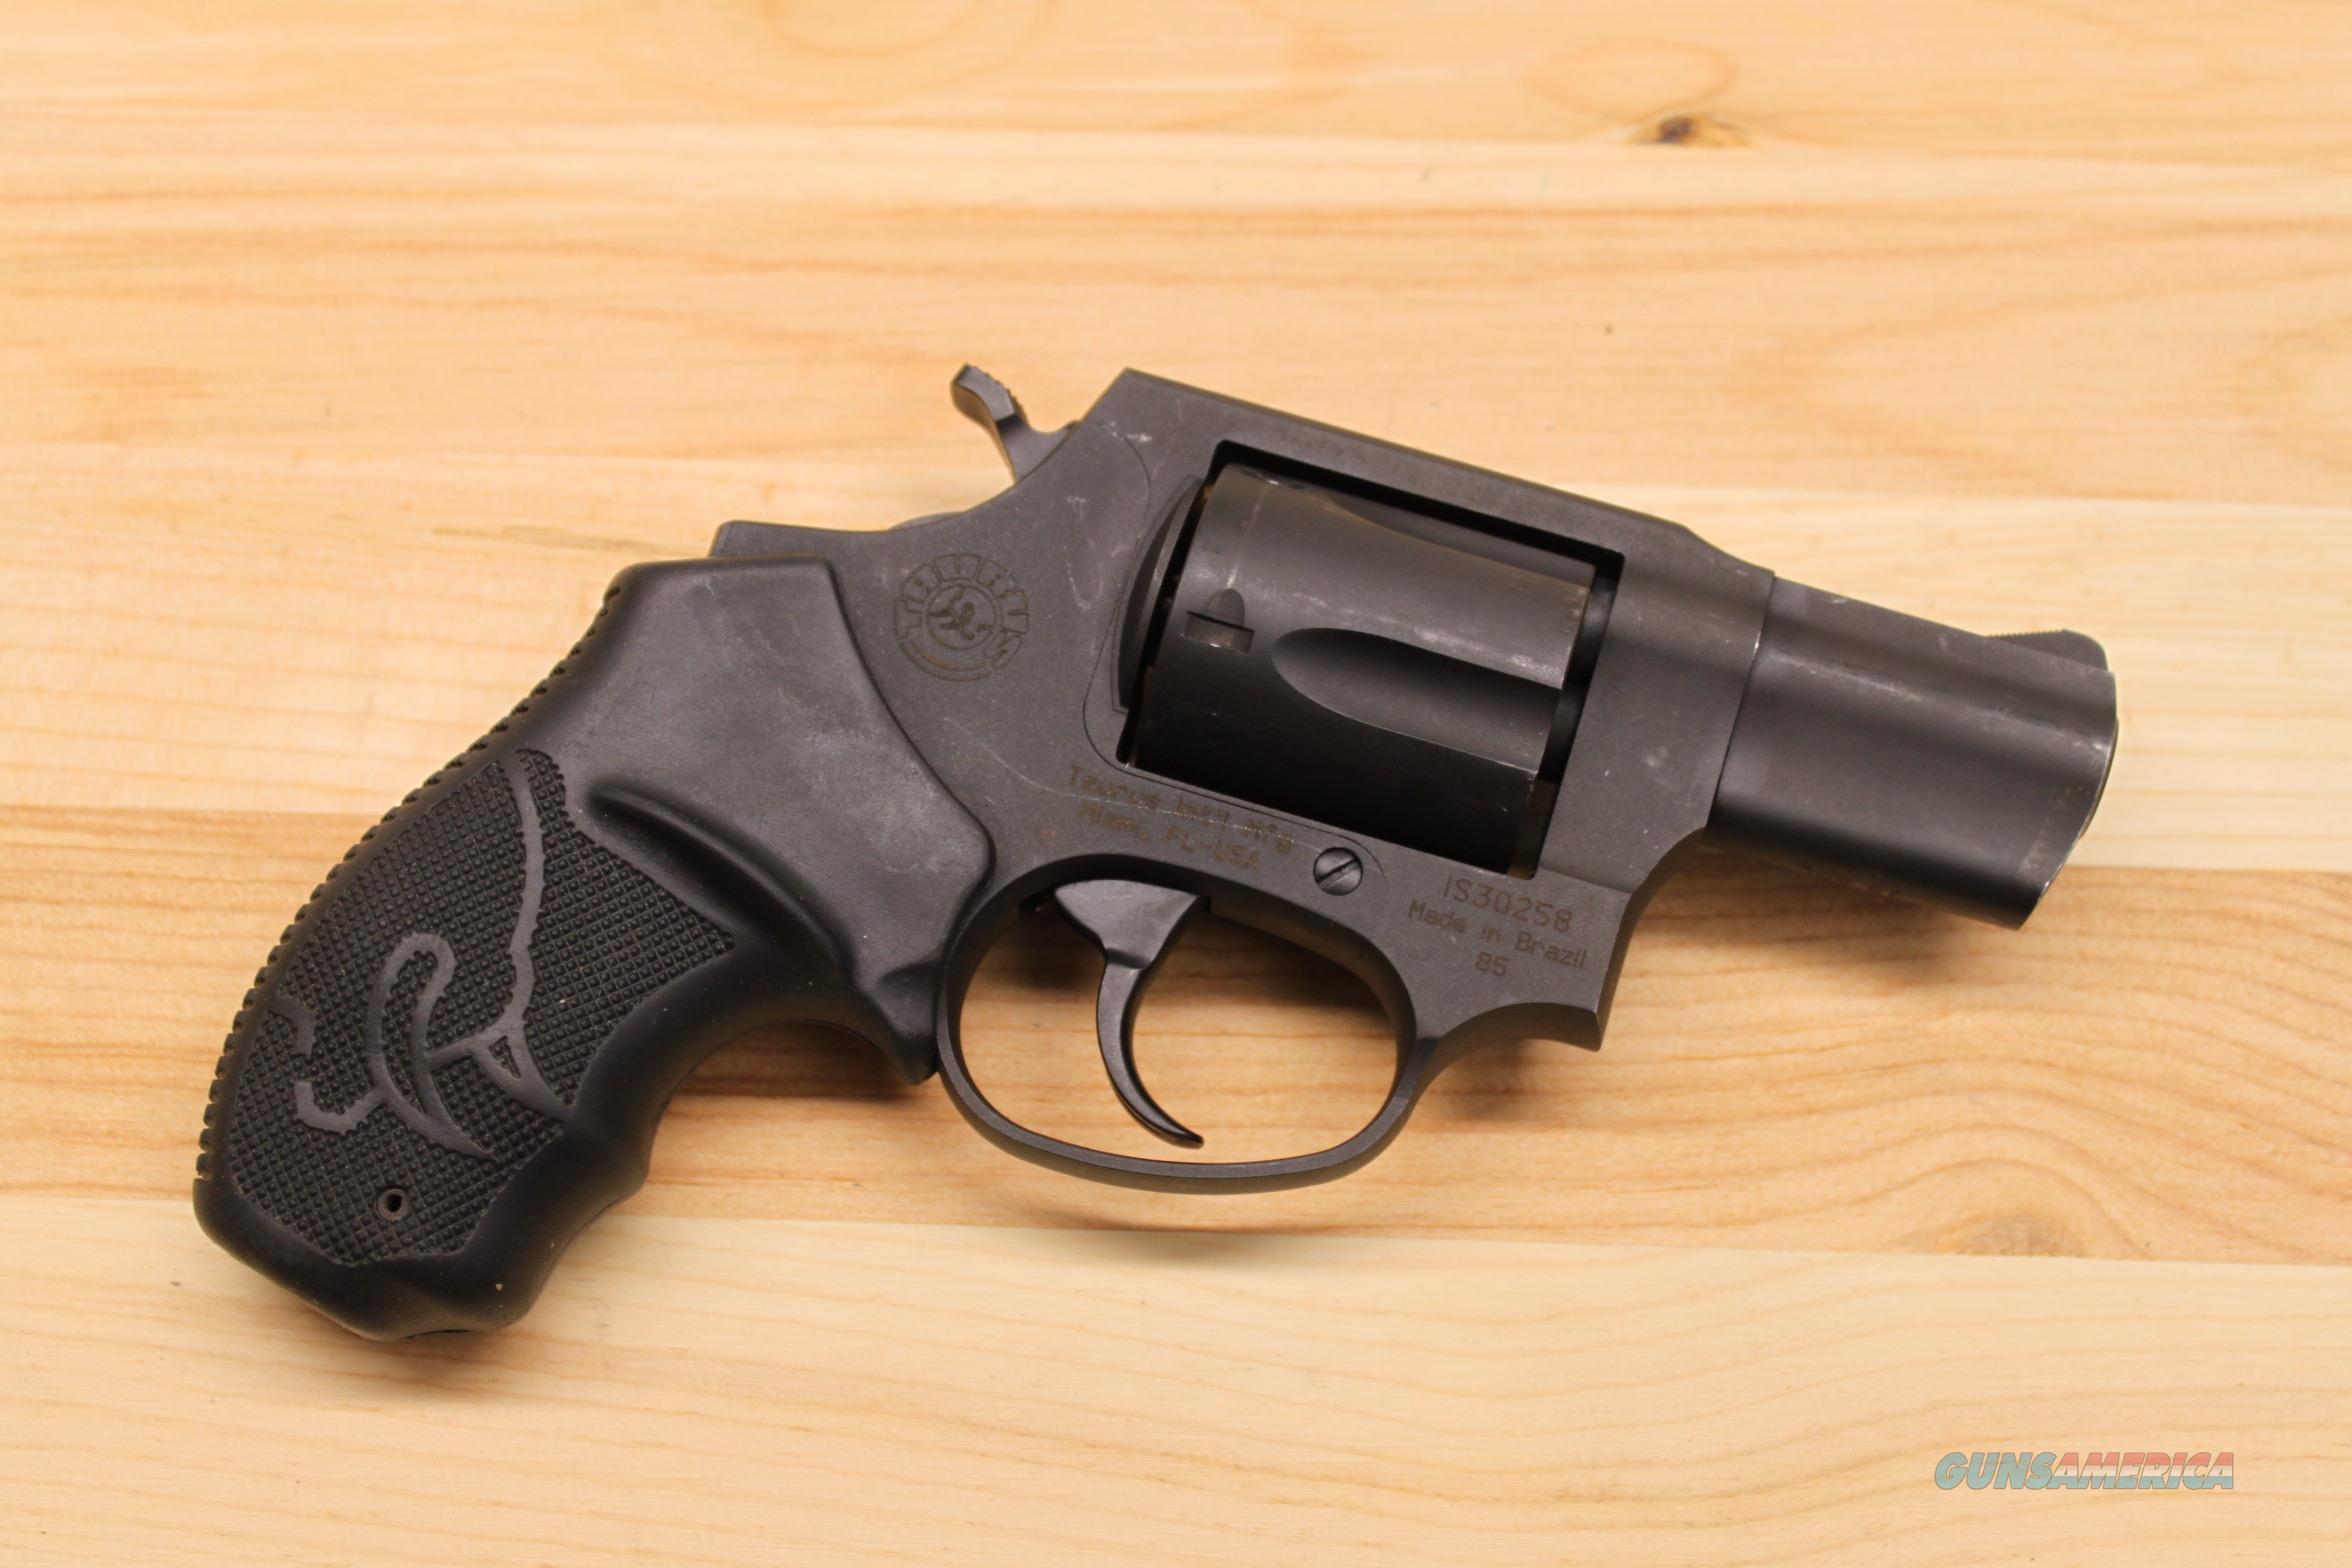 Taurus Pistols Revolver Local Deals National For Sale User